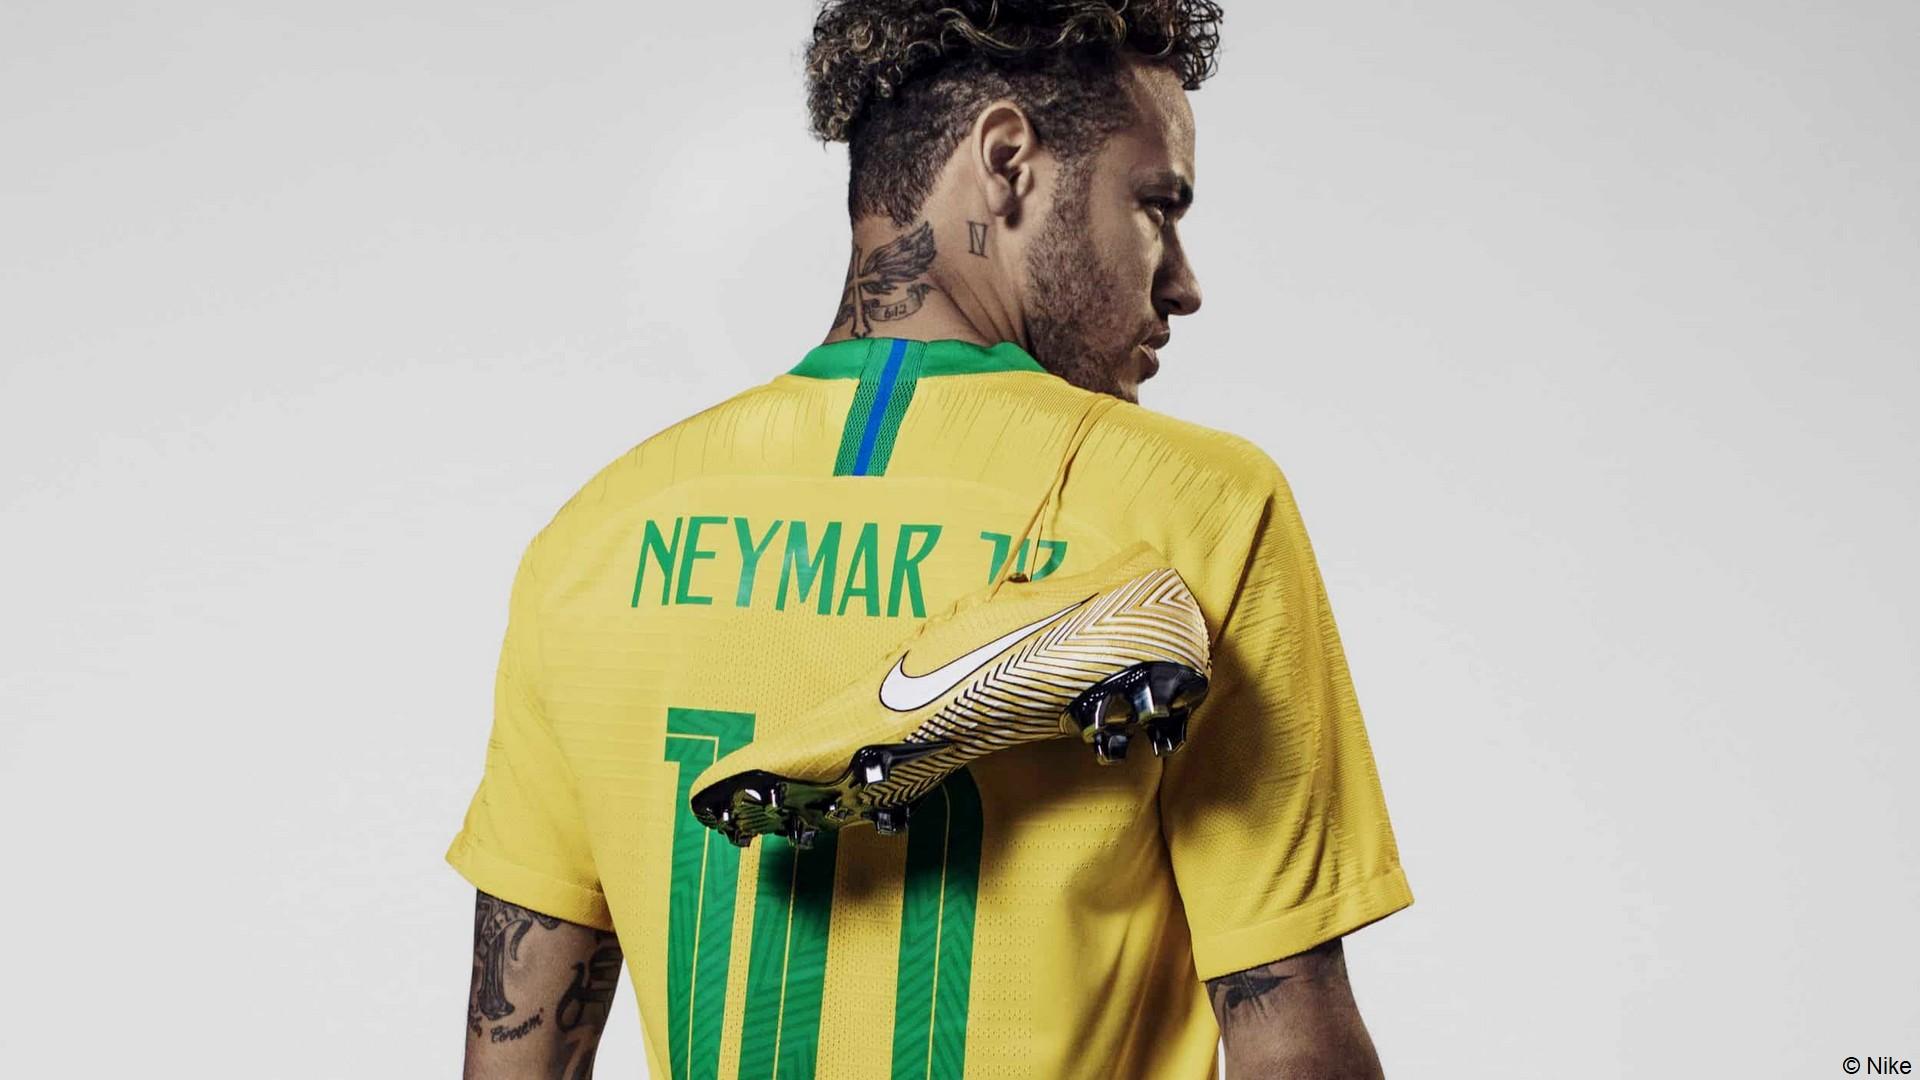 Nike x Neymar (football) 2021